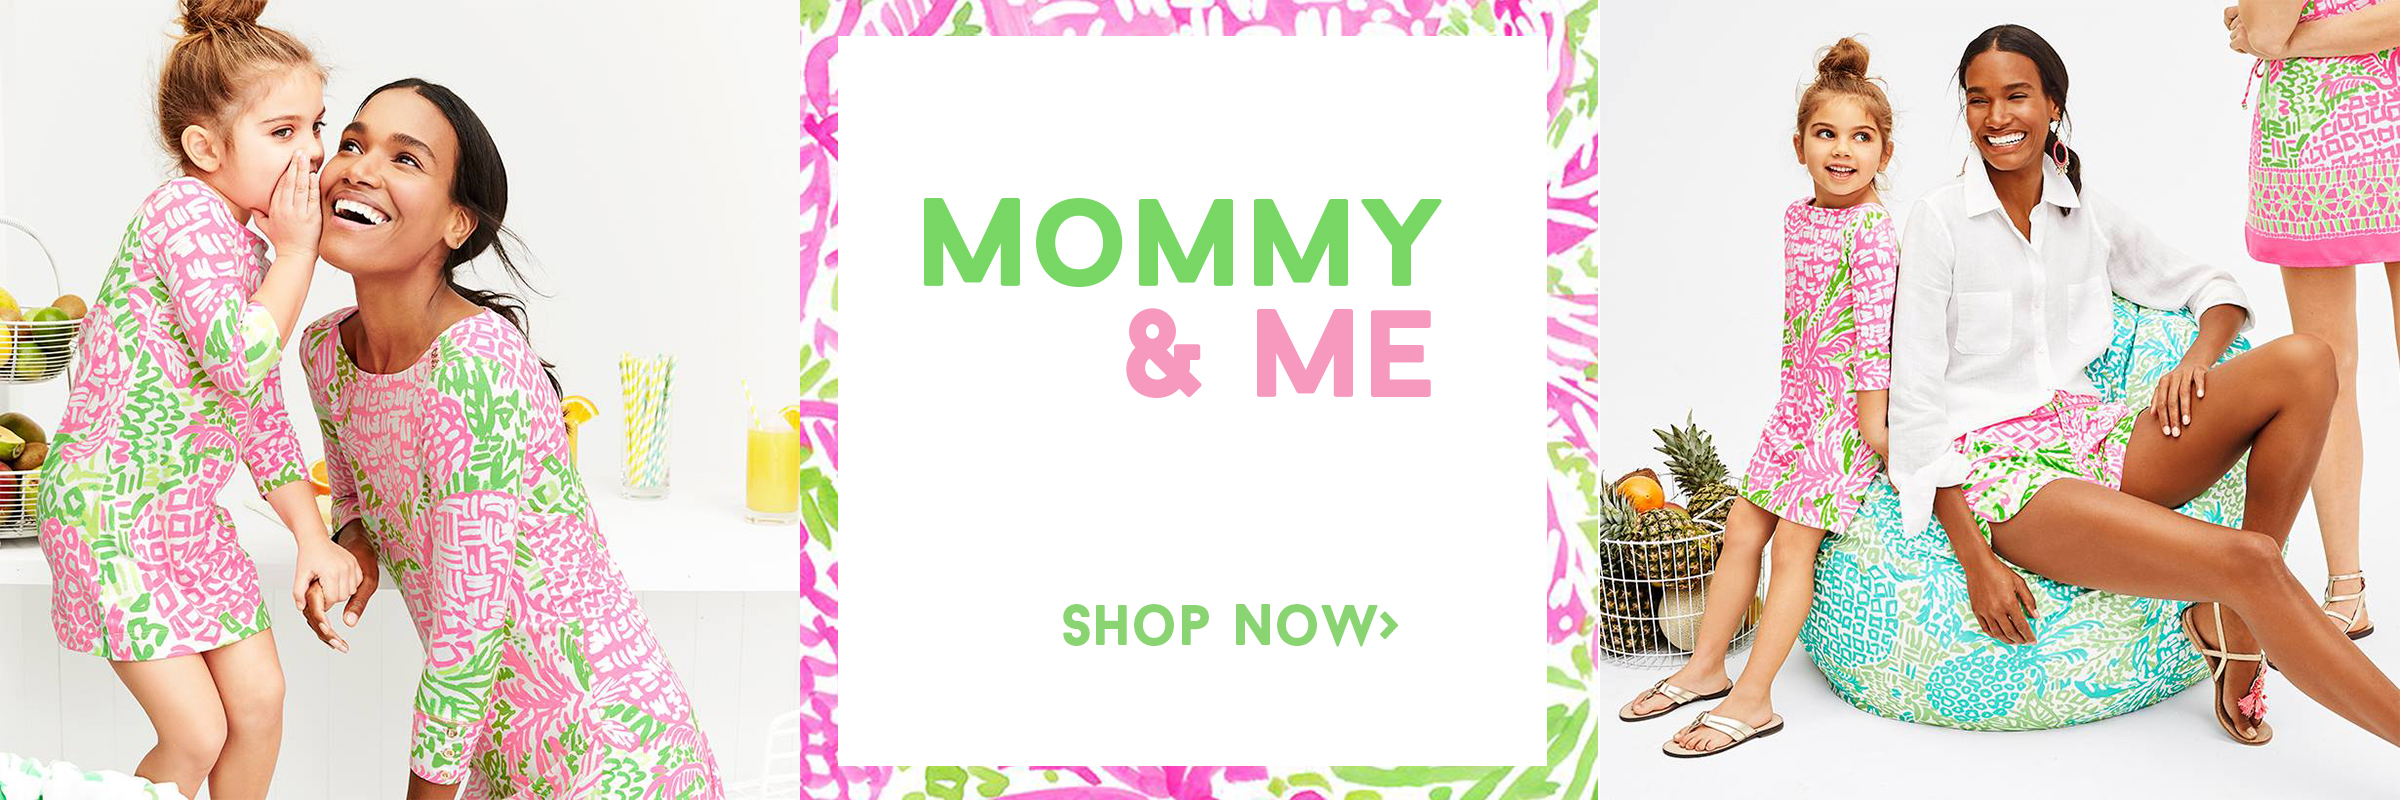 Mommy _ me.jpg